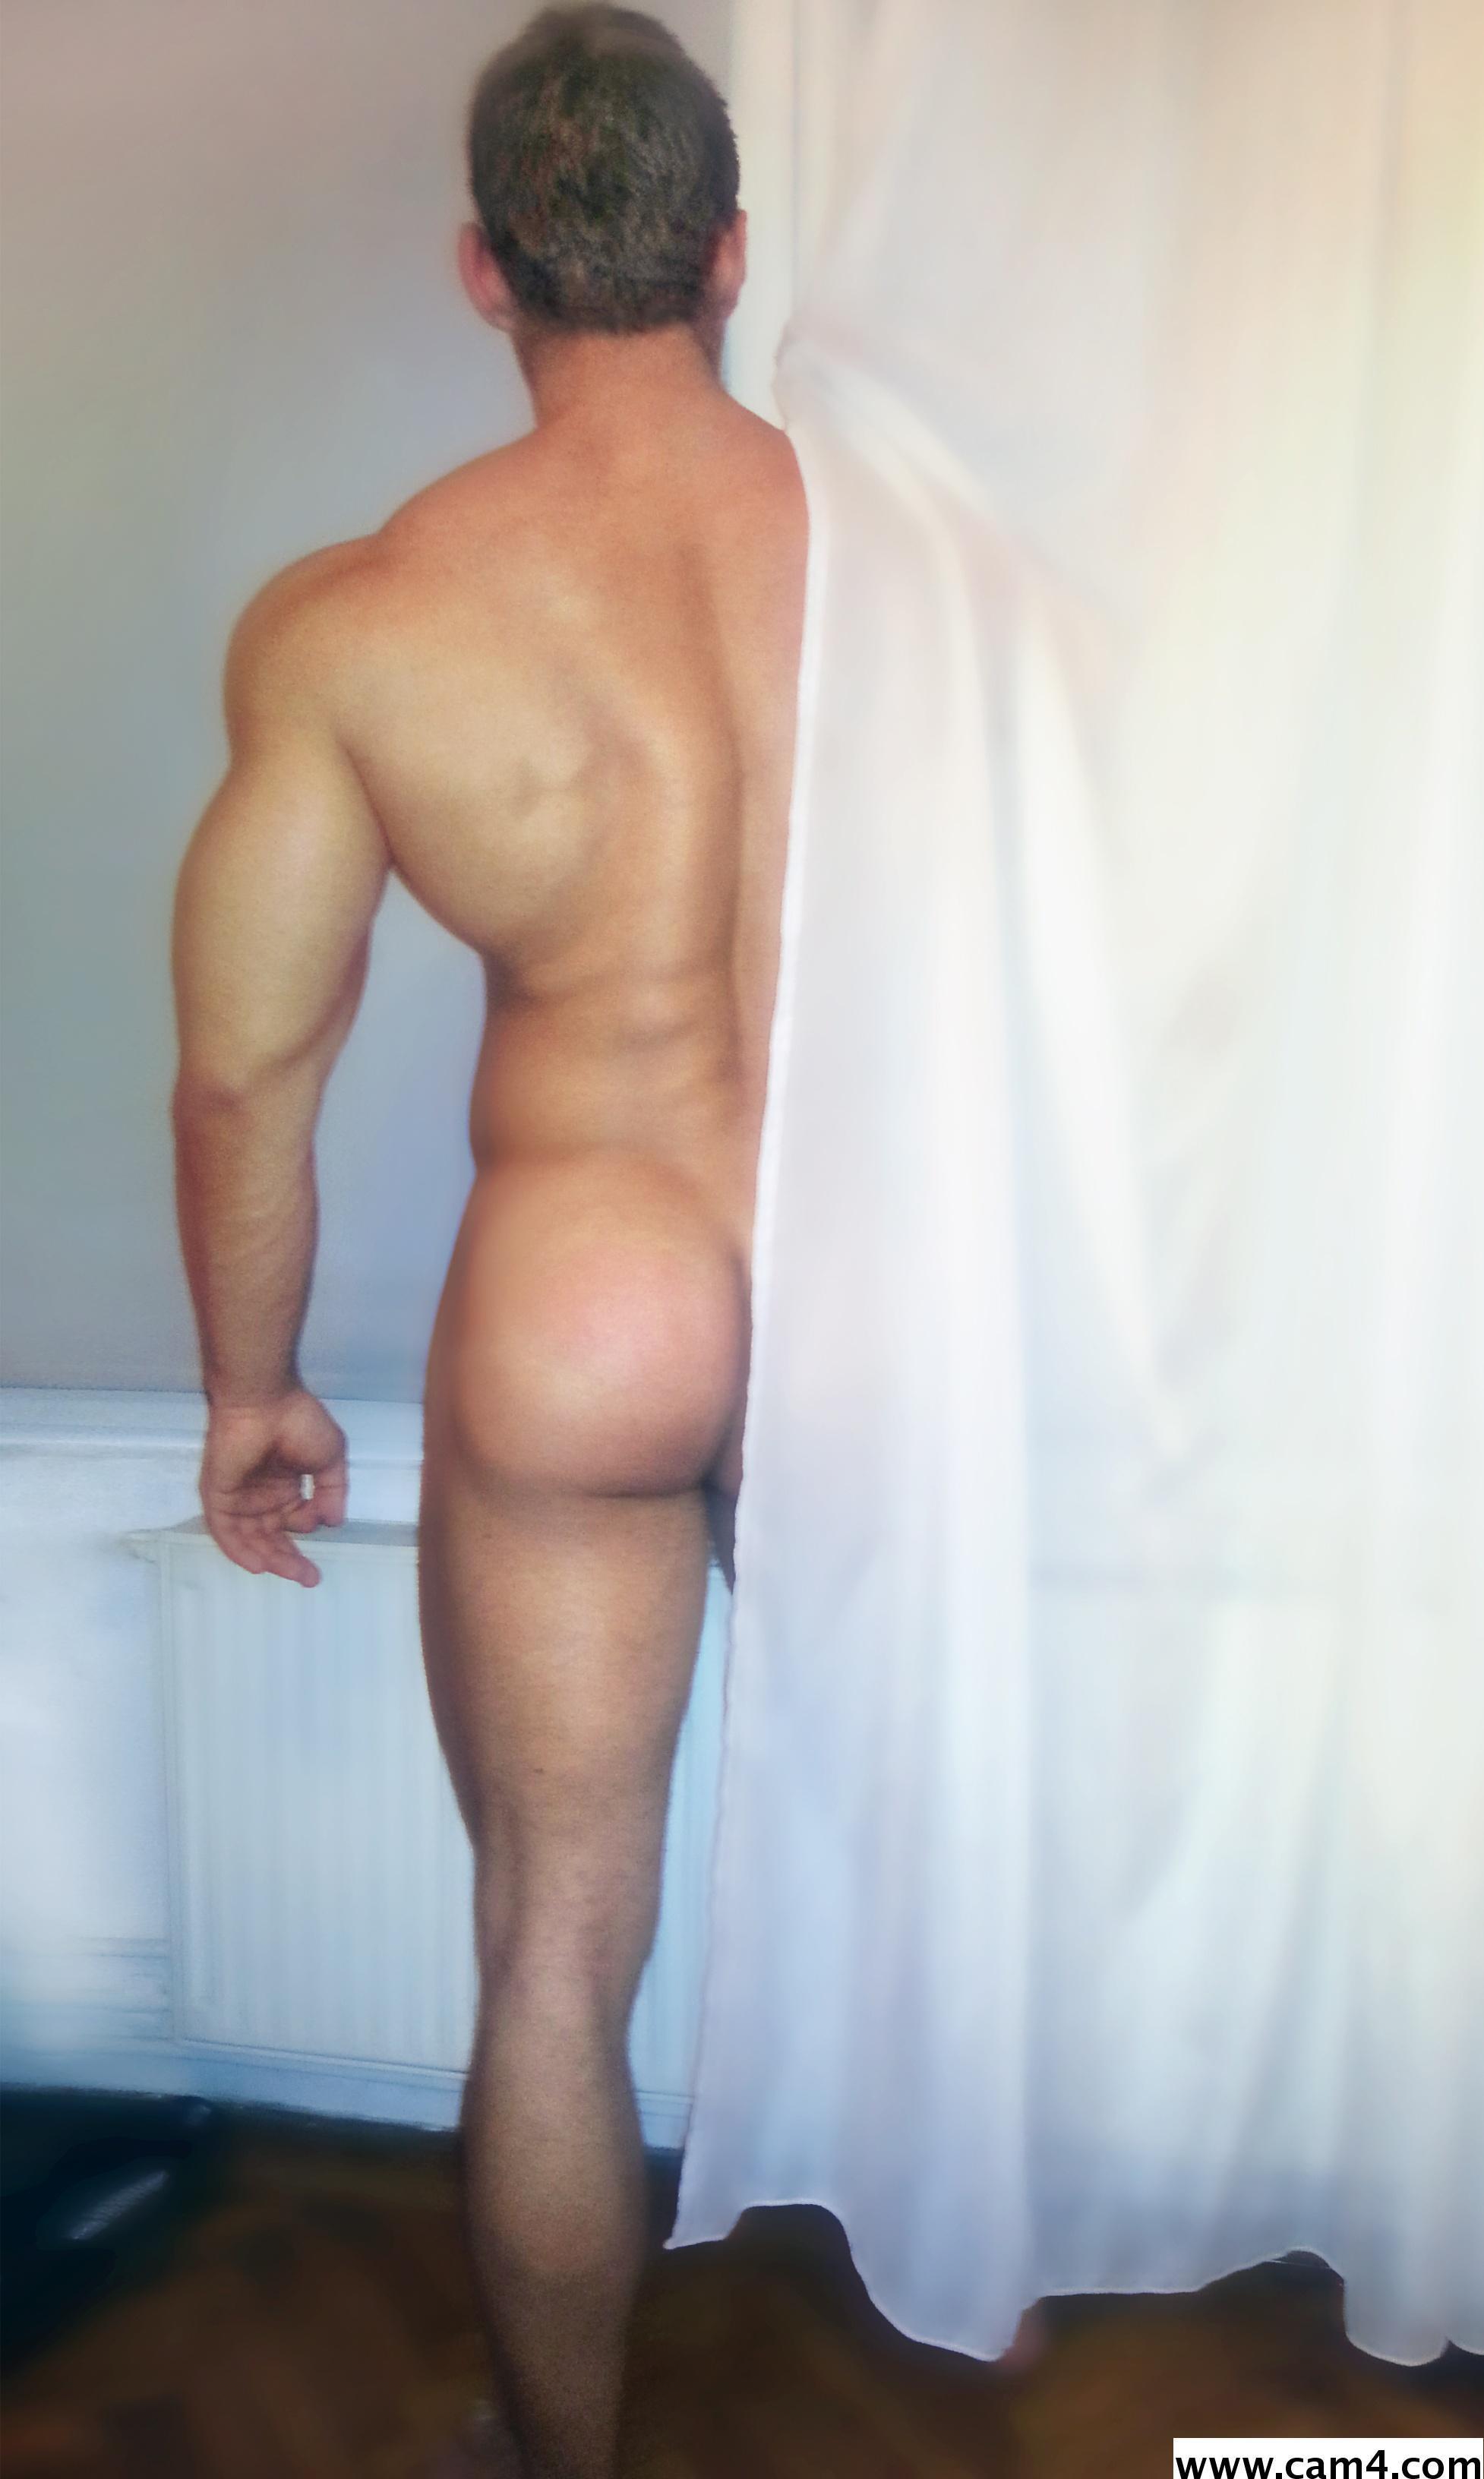 Hottt ass?s=sv5lkofczwgcw69ngubfh+ymprklspr9mpcofyxfrfe=